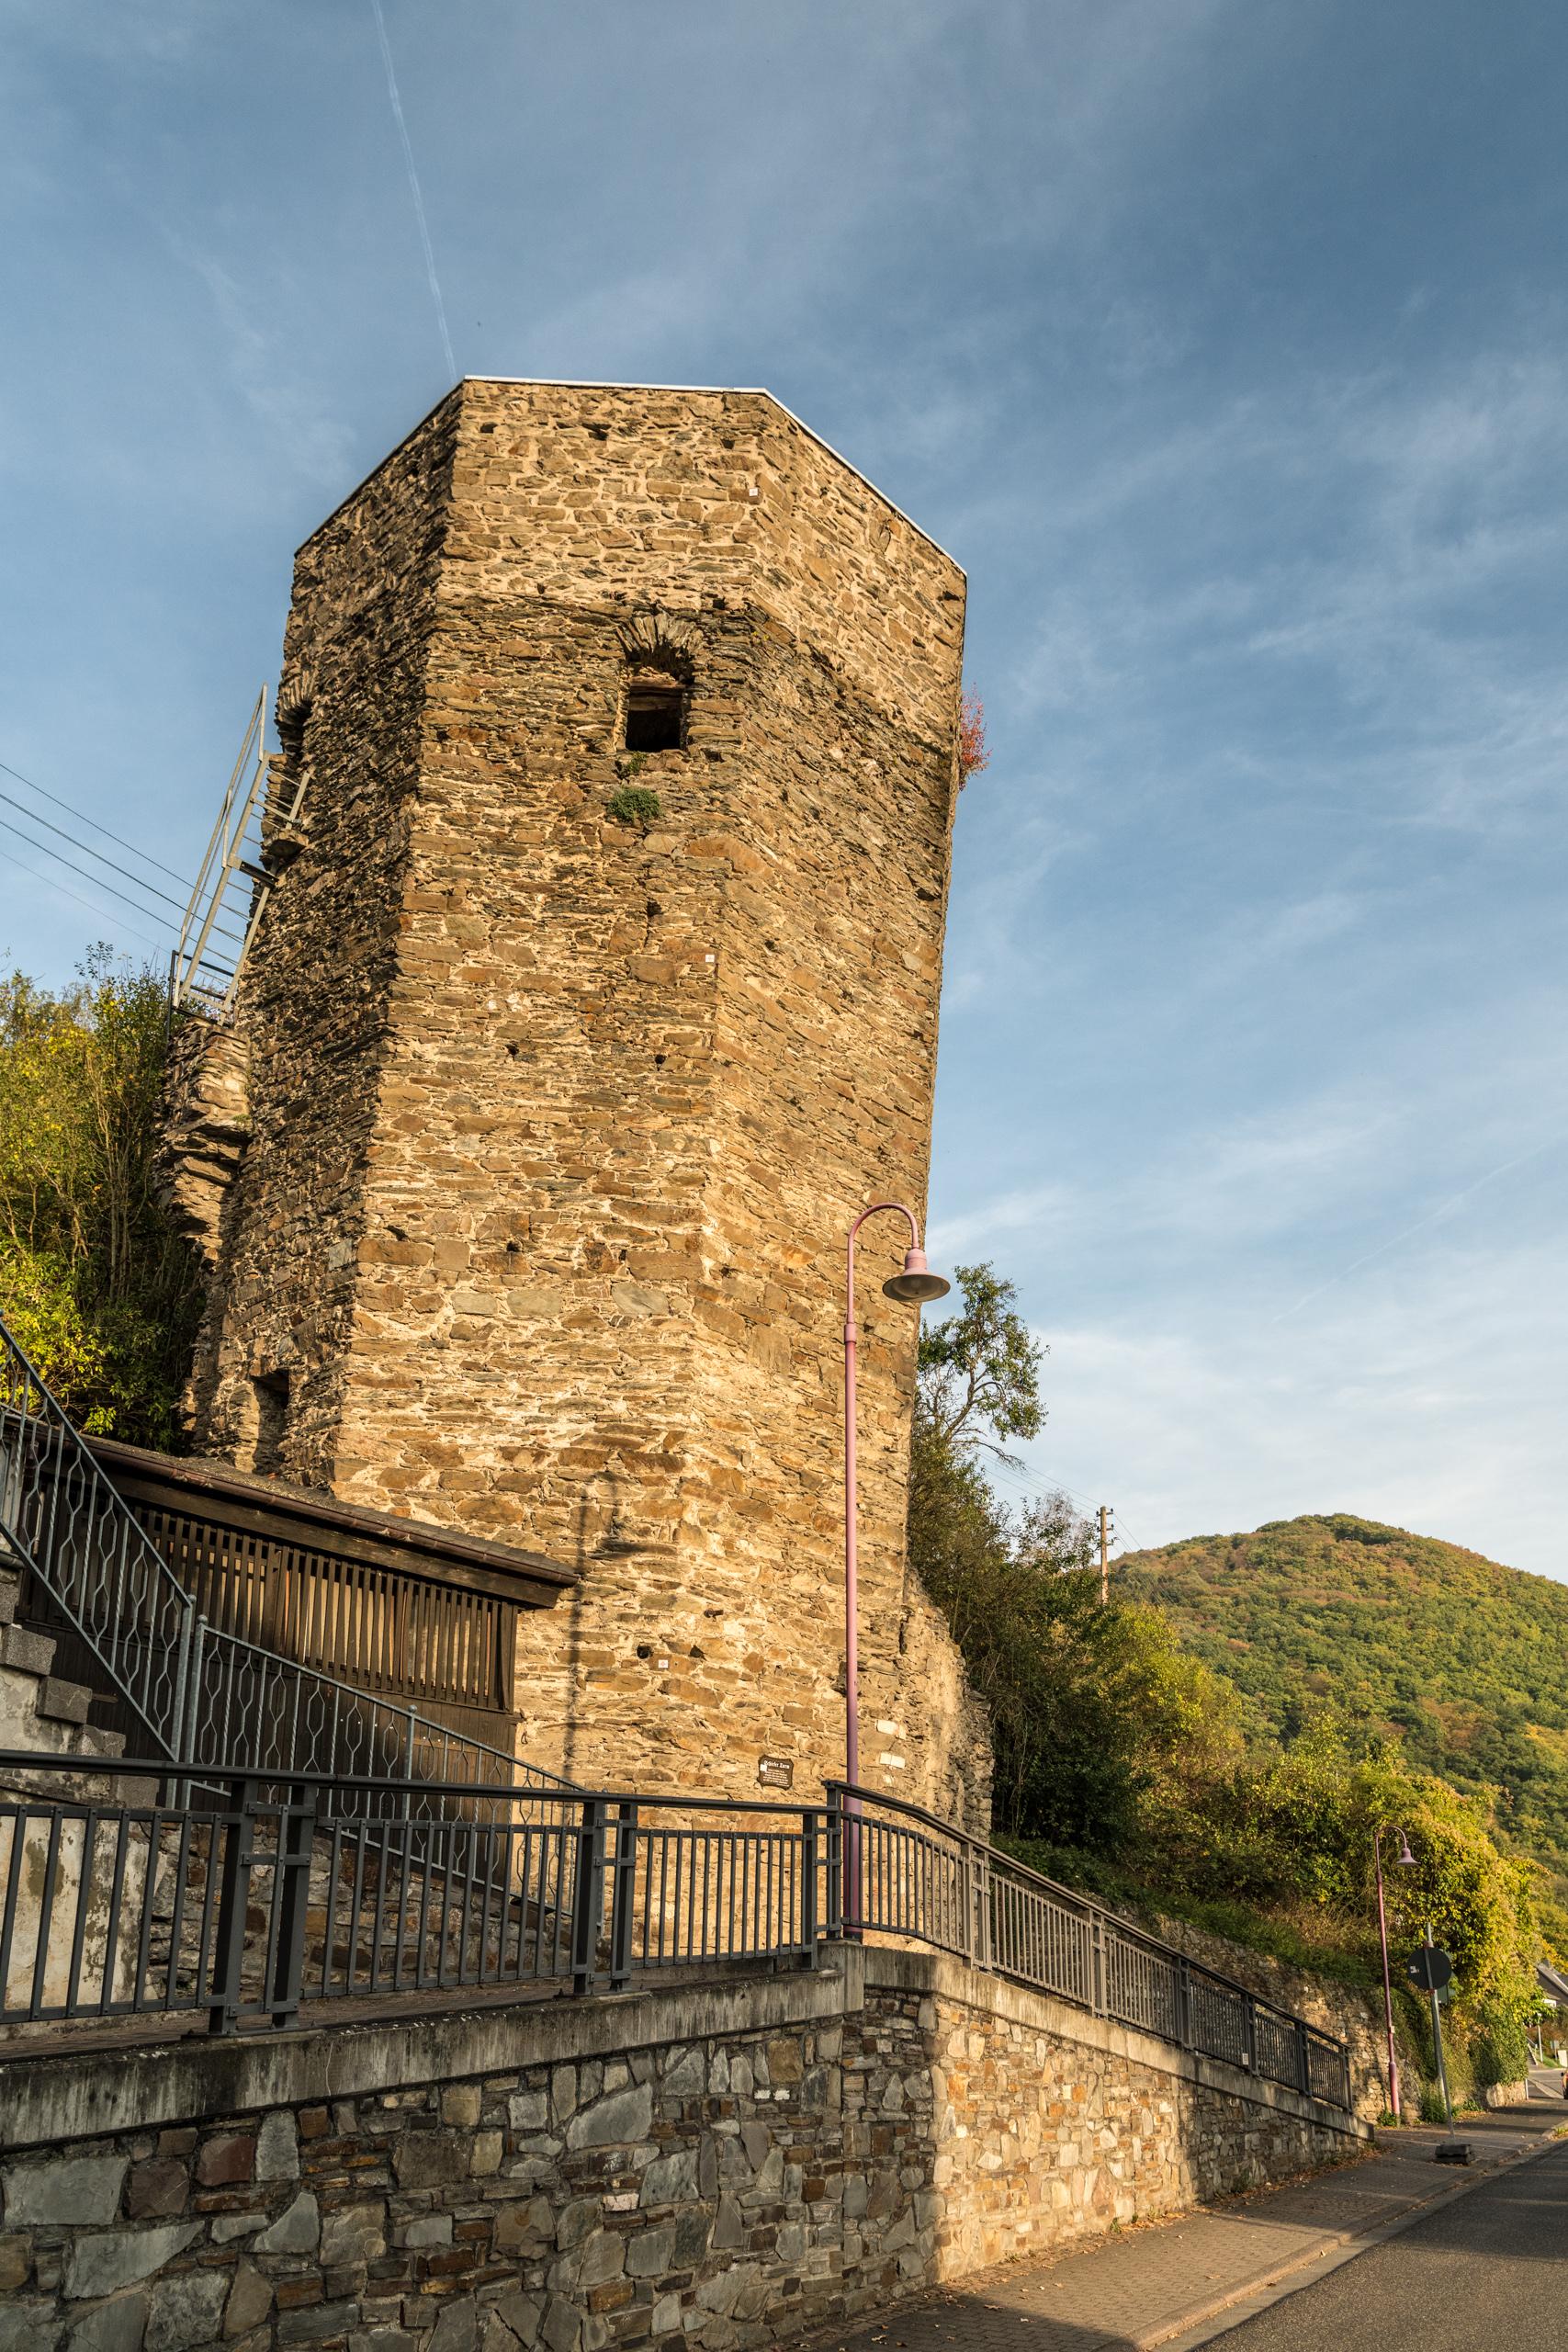 Schiefer Turm von Dausenau